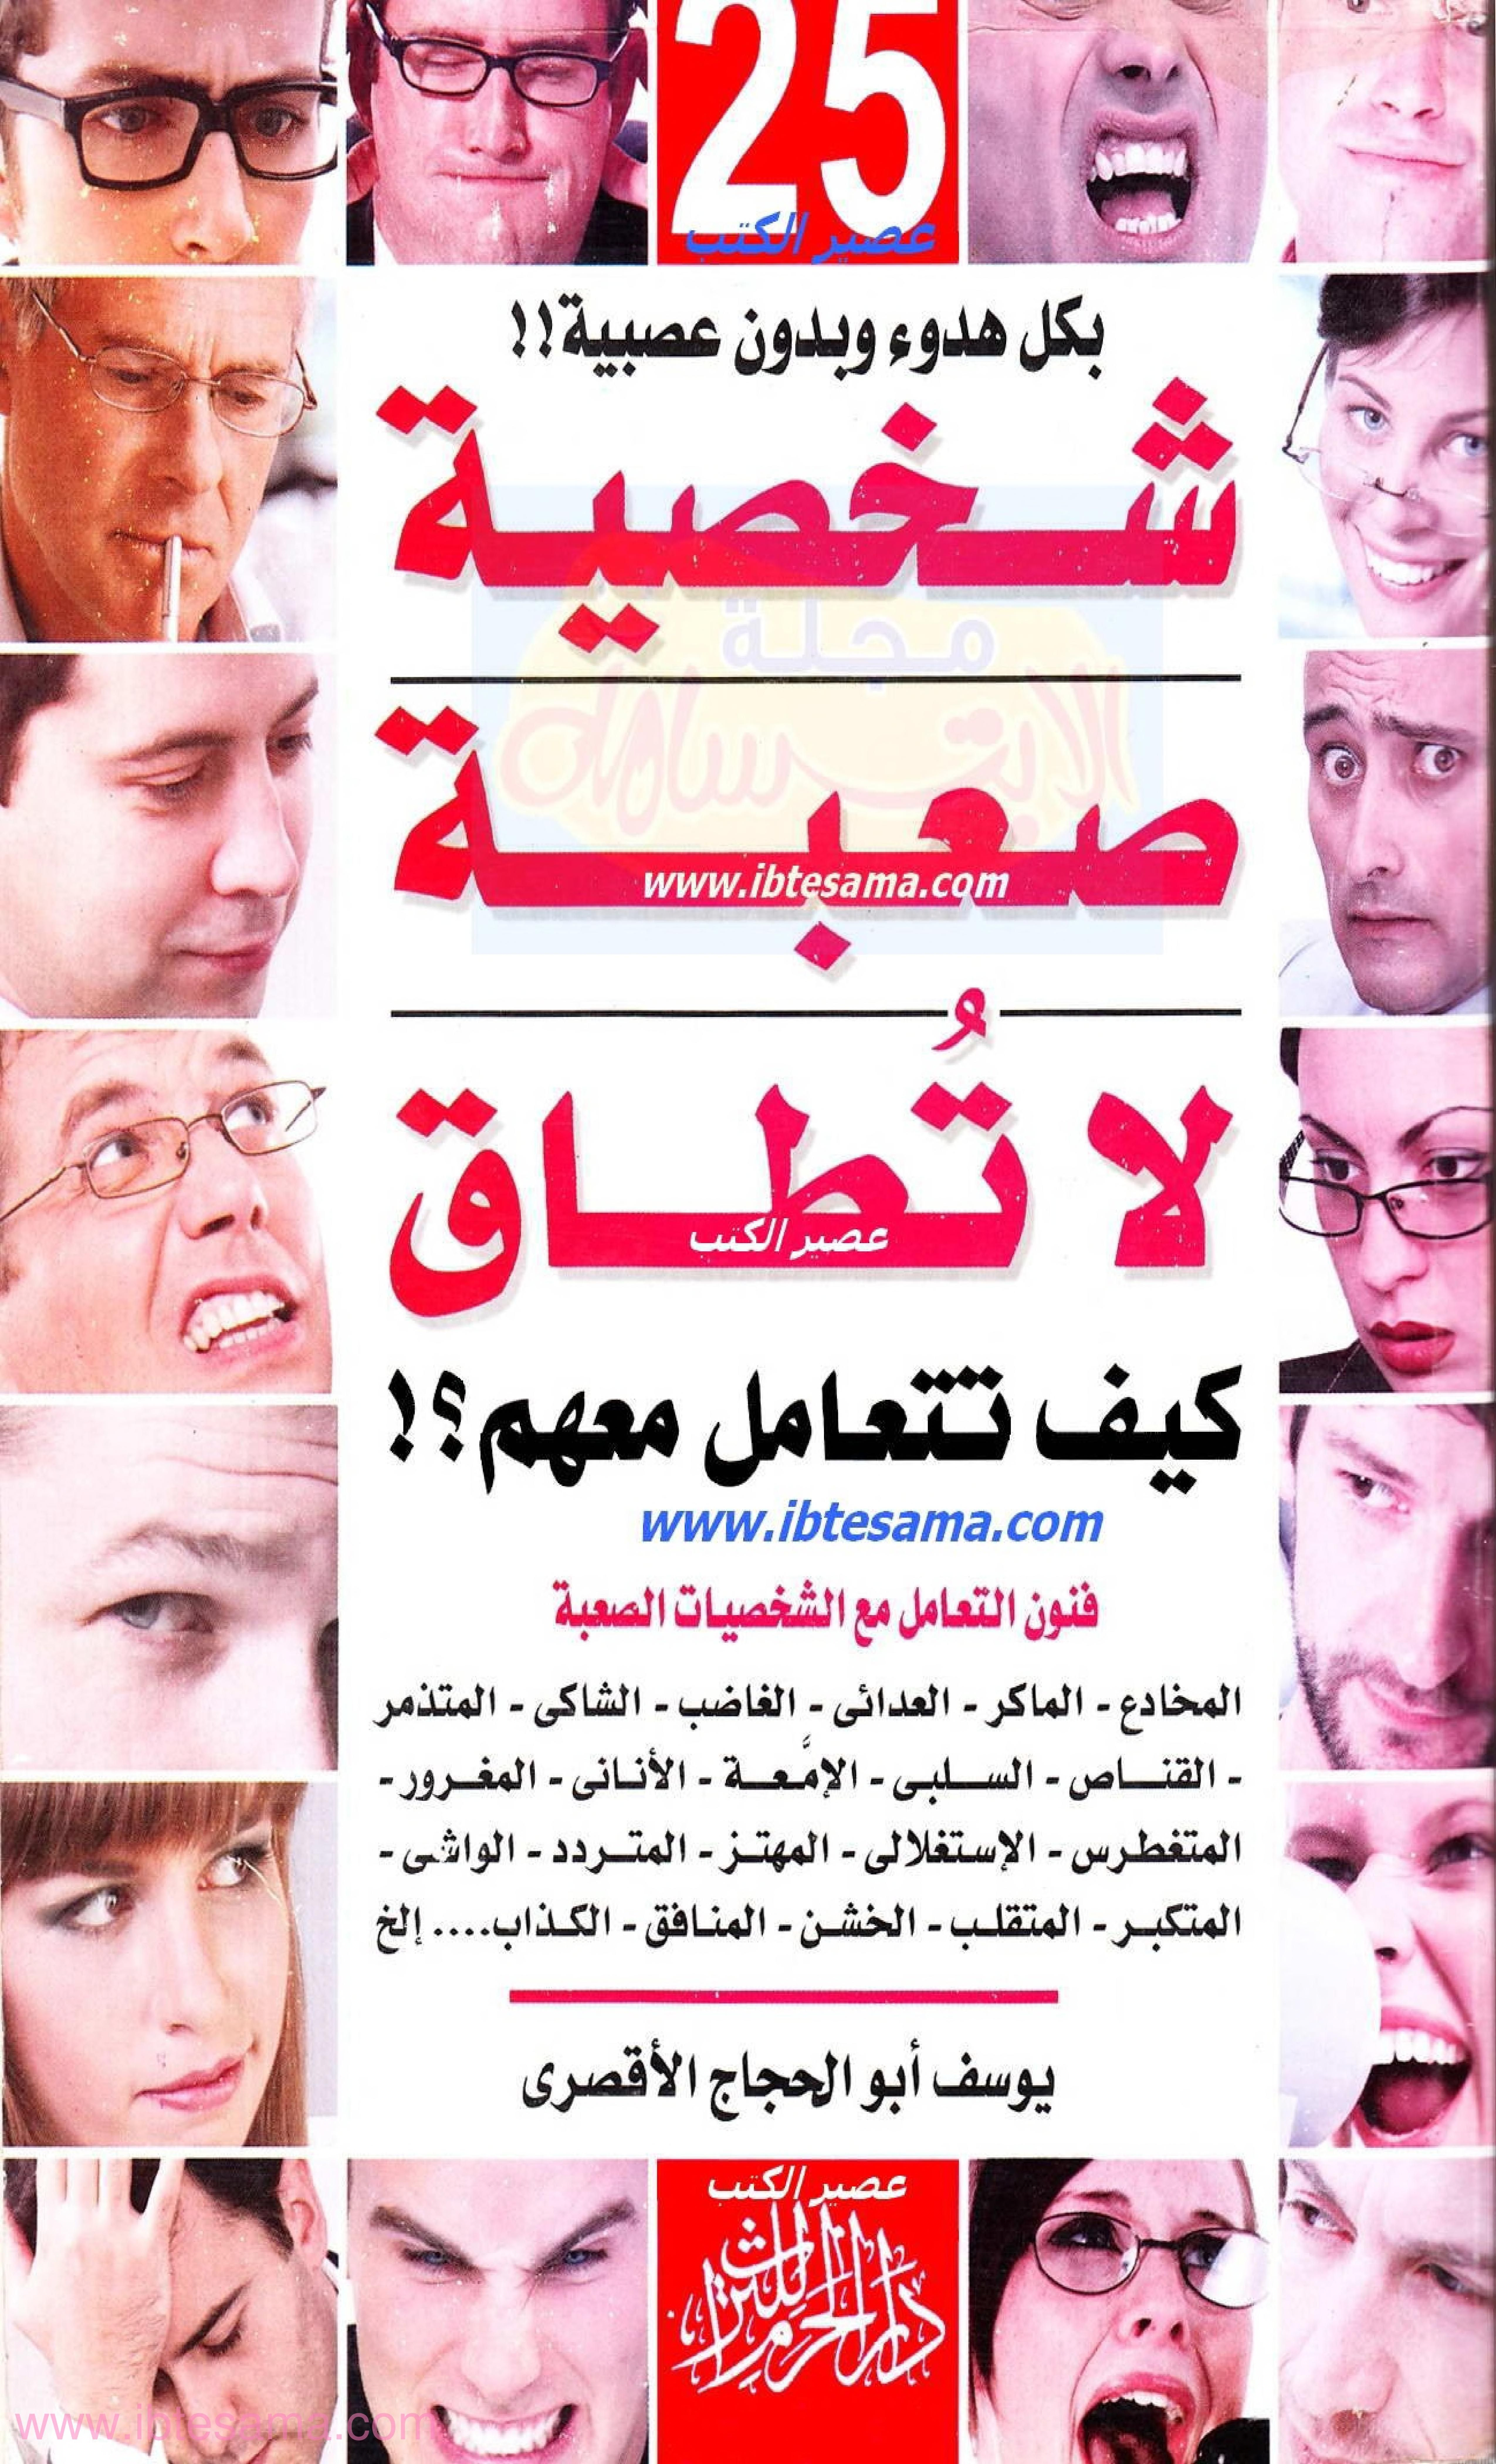 تطوير الذات Free Download Borrow And Streaming Internet Archive Ebooks Free Books Book Club Books Arabic Books